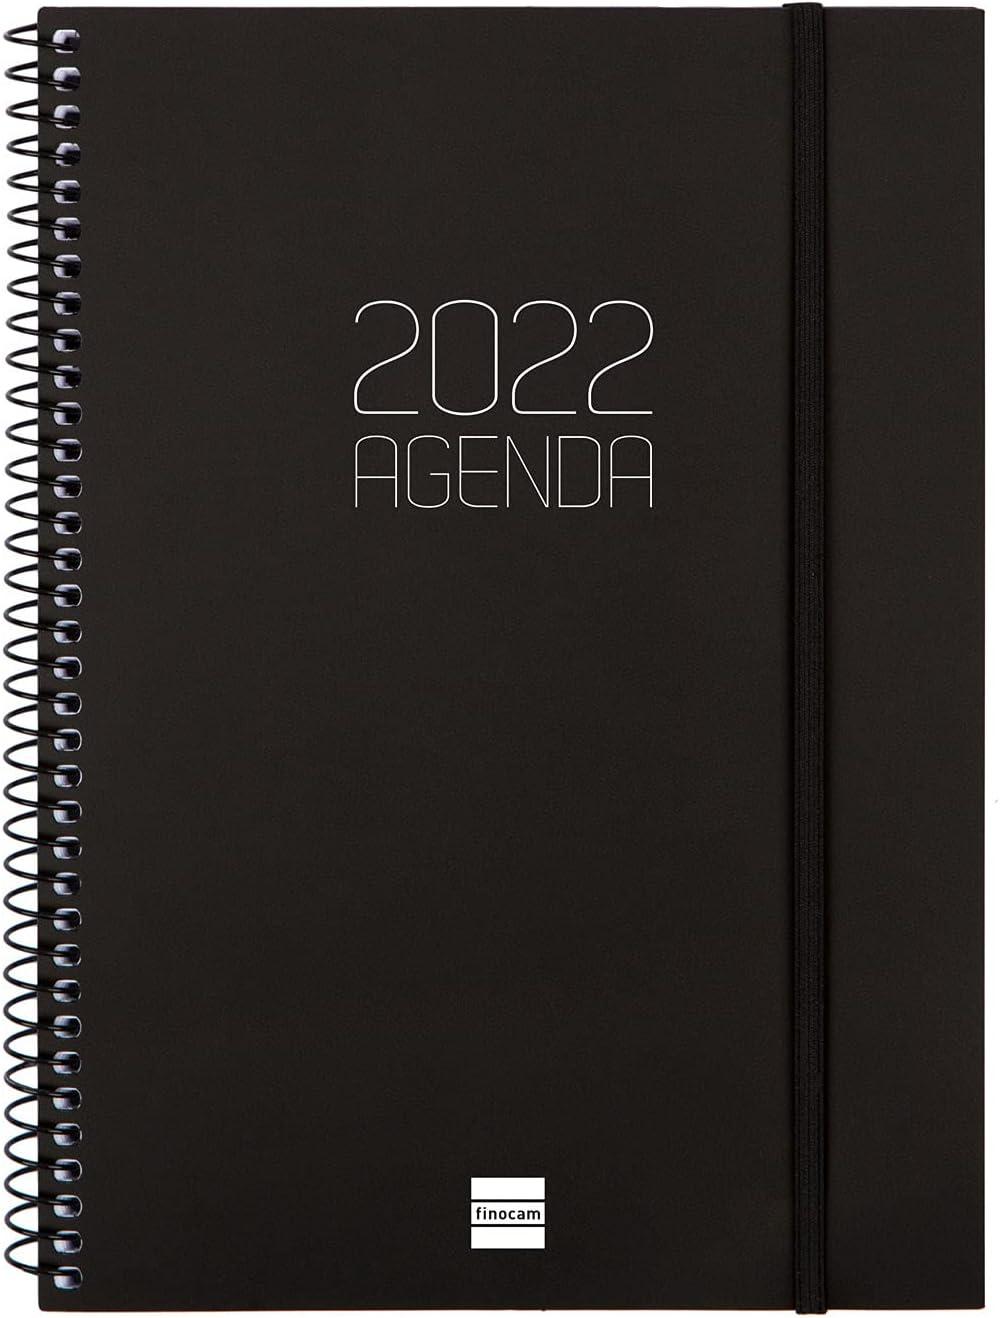 Finocam - Agenda 2022 semanal horizontal, de enero 2022 a diciembre 2022 (12 meses) E10 – 155 x 212 mm espiral mate negro italiano